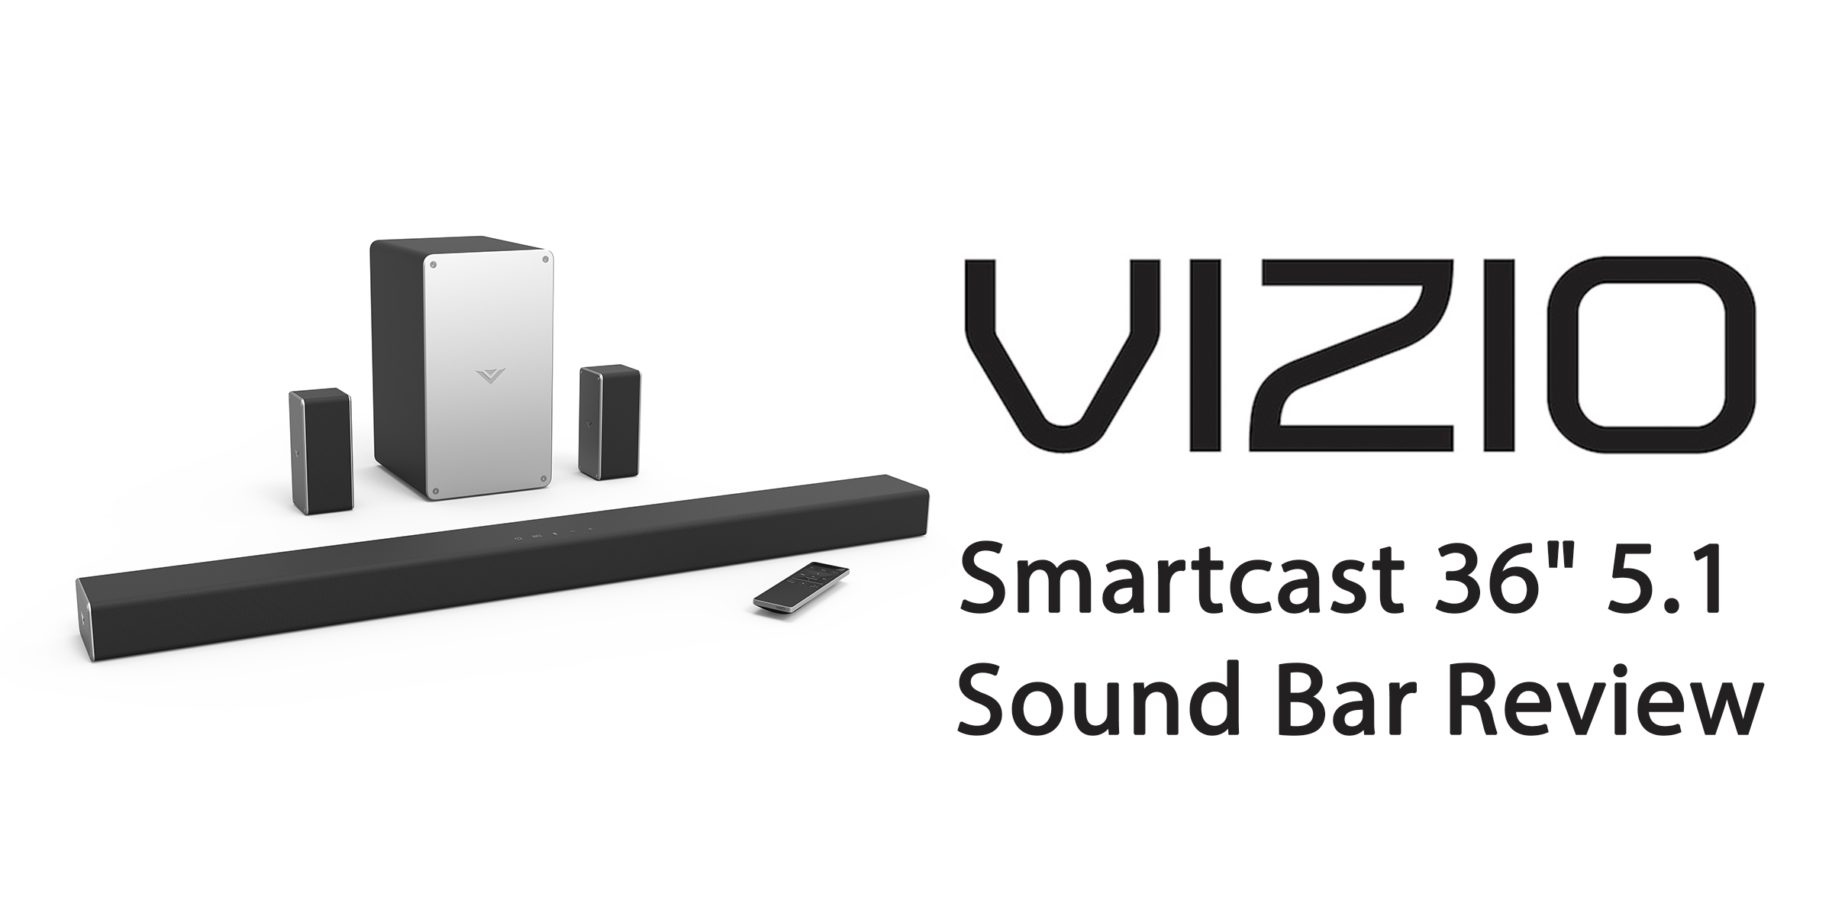 "Vizio Smartcast 36"" 5.1 Sound Bar  Image: Vizio"